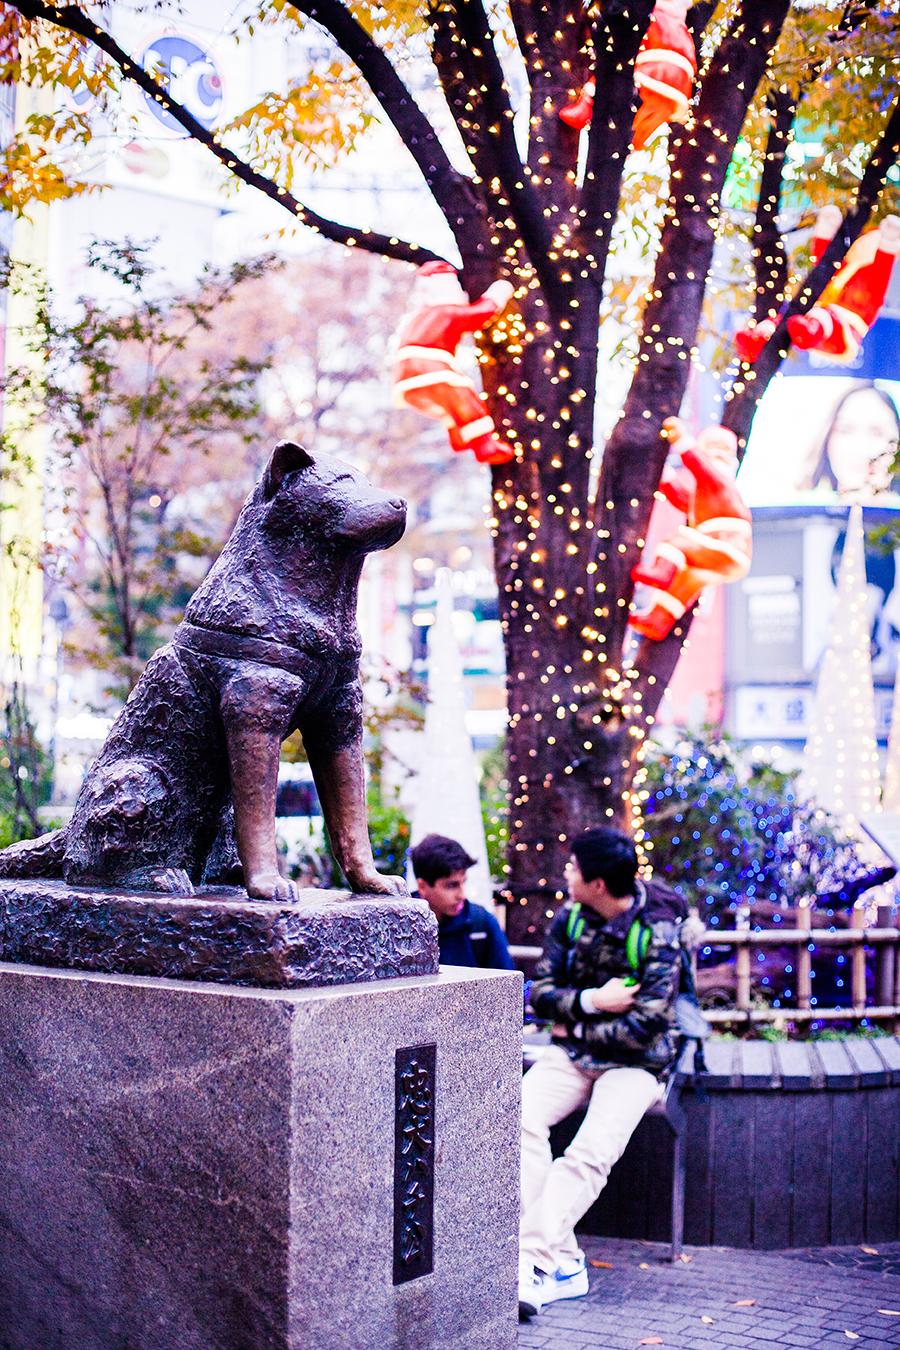 Statue of Hachiko in Shibuya, Japan.